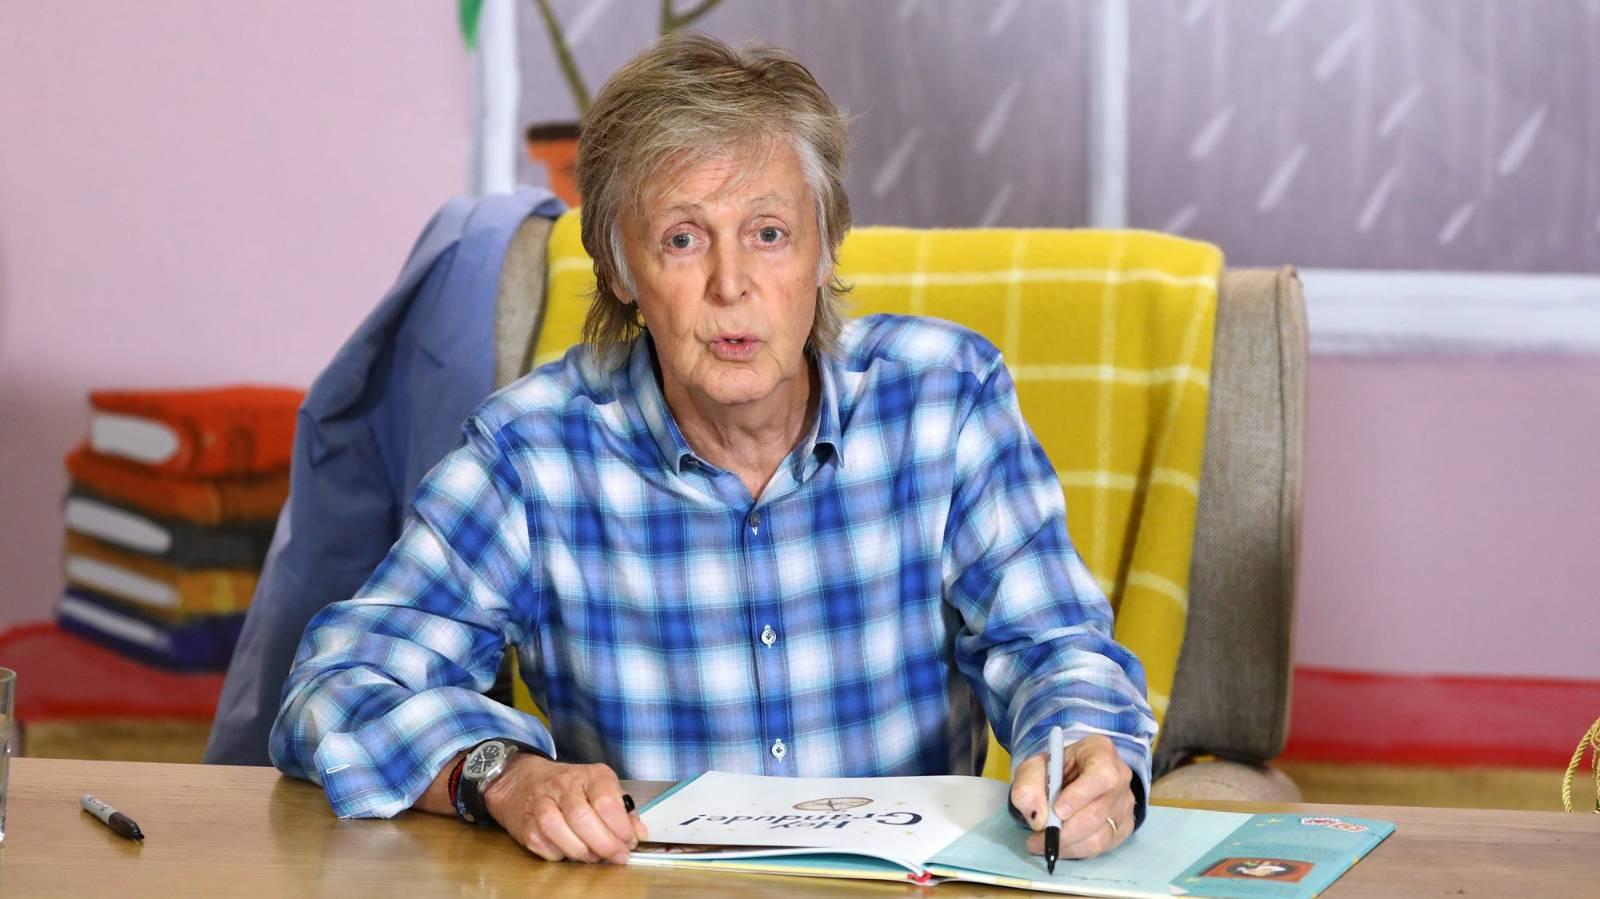 Roll up! Paul McCartney's anti-aging eye yoga